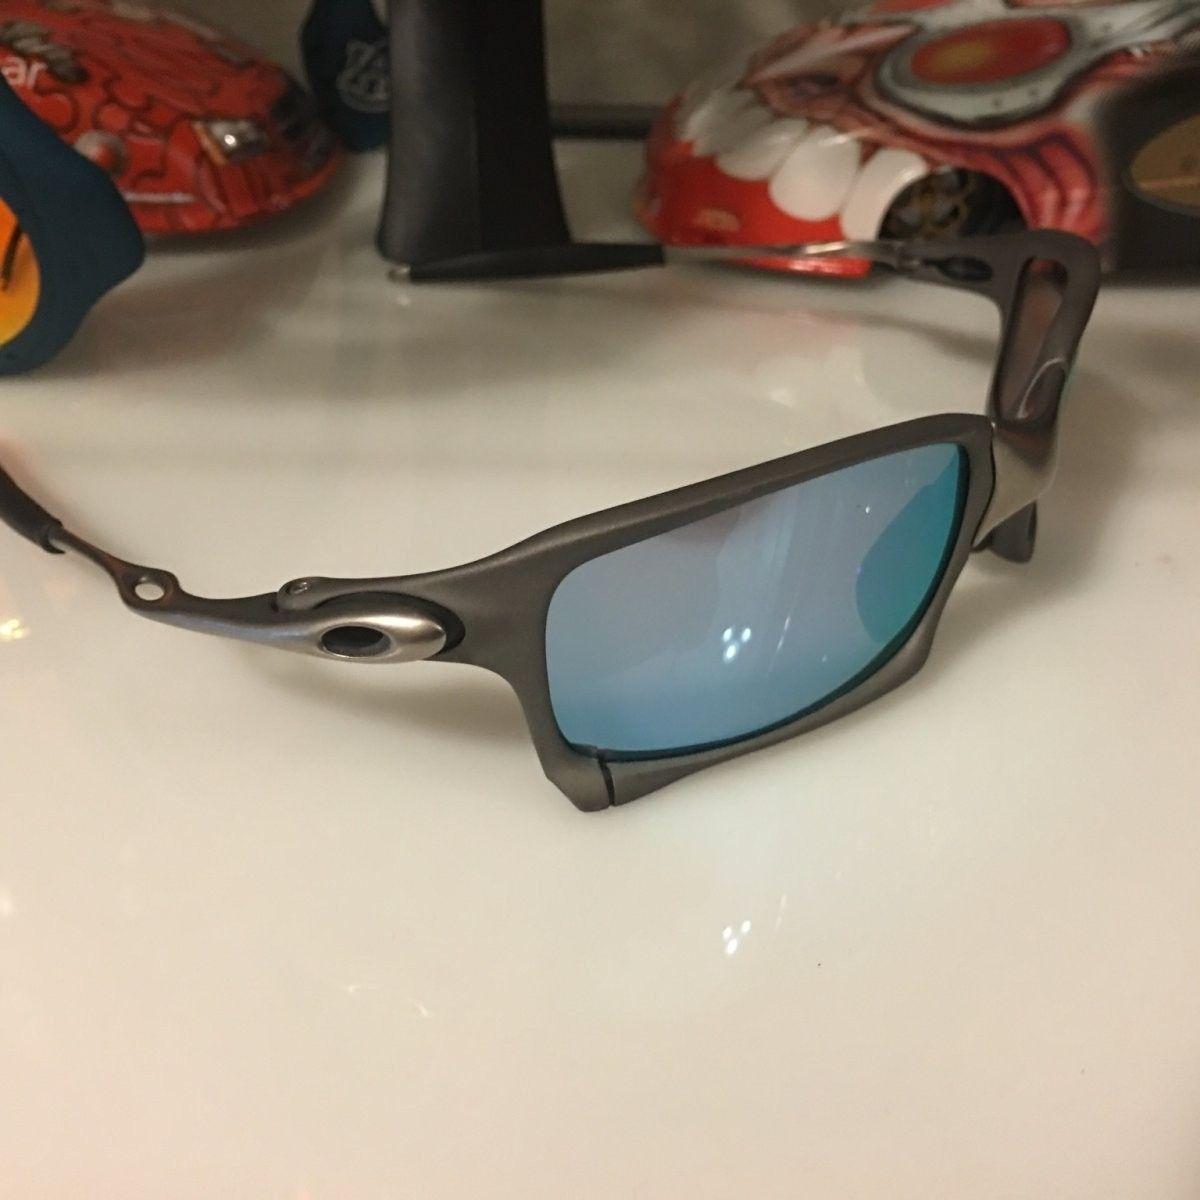 Reverse TiO2 XS with Deep Water Prizm lenses - ImageUploadedByTapatalk1453569674.018897.jpg